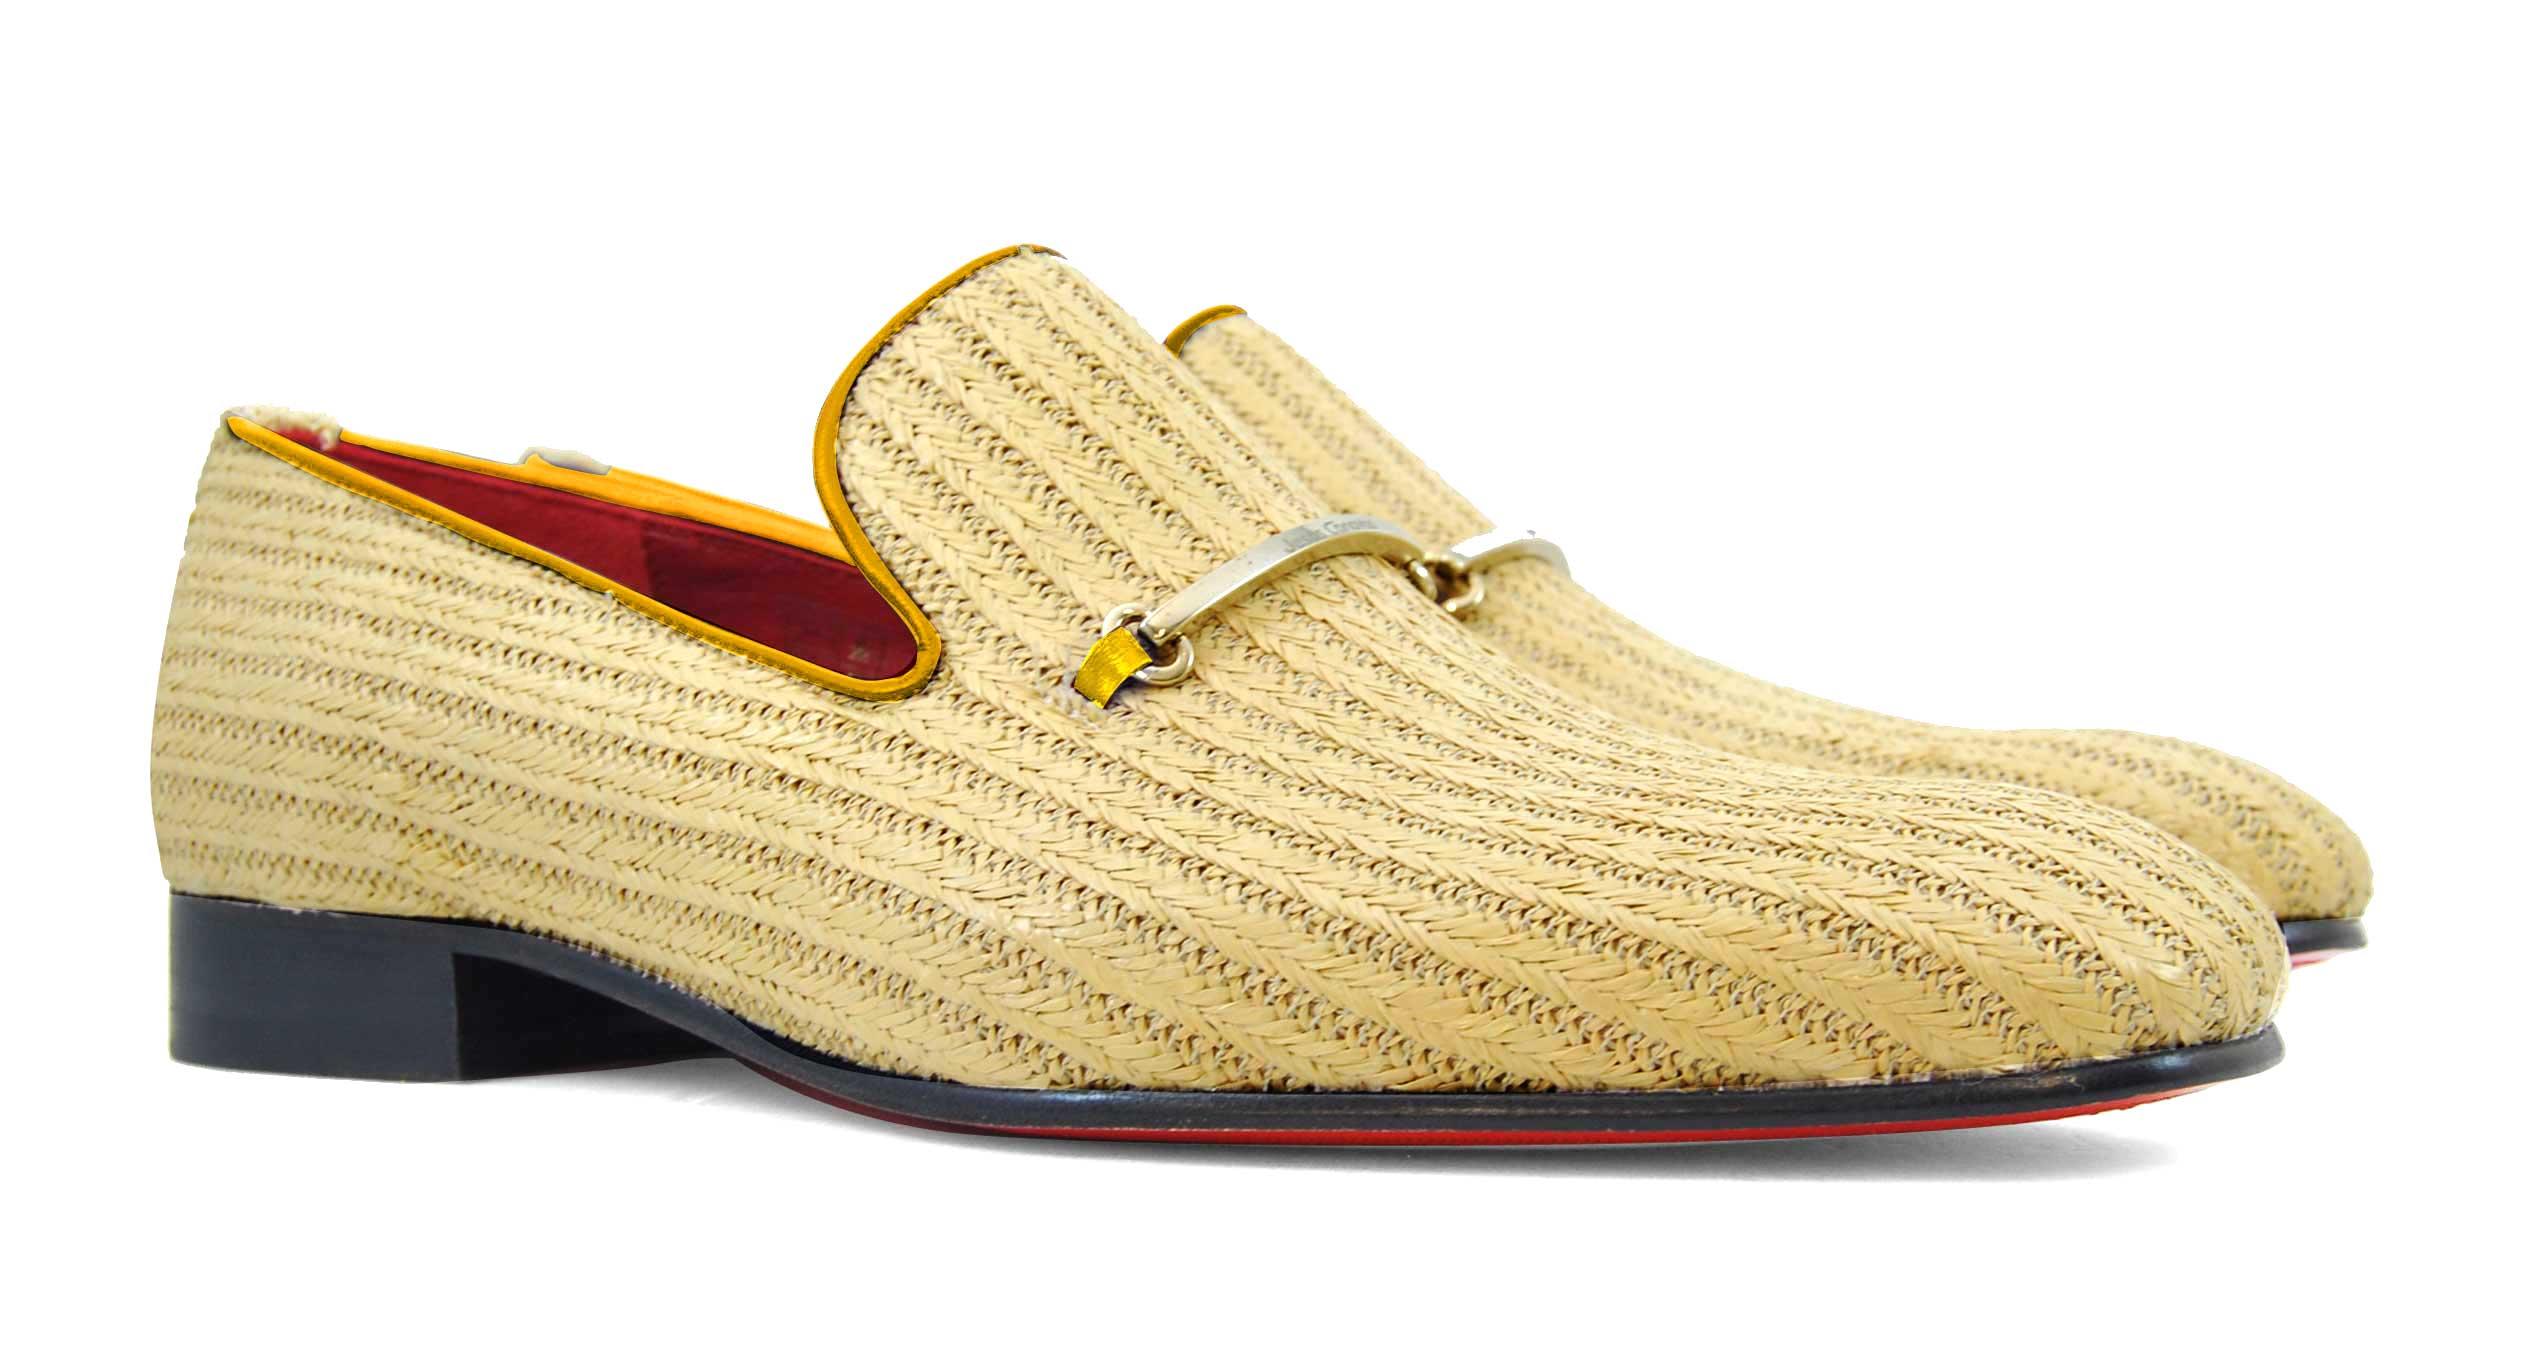 Foto 5 de Zapatos Palma Panameña Con Ribete Amarillo